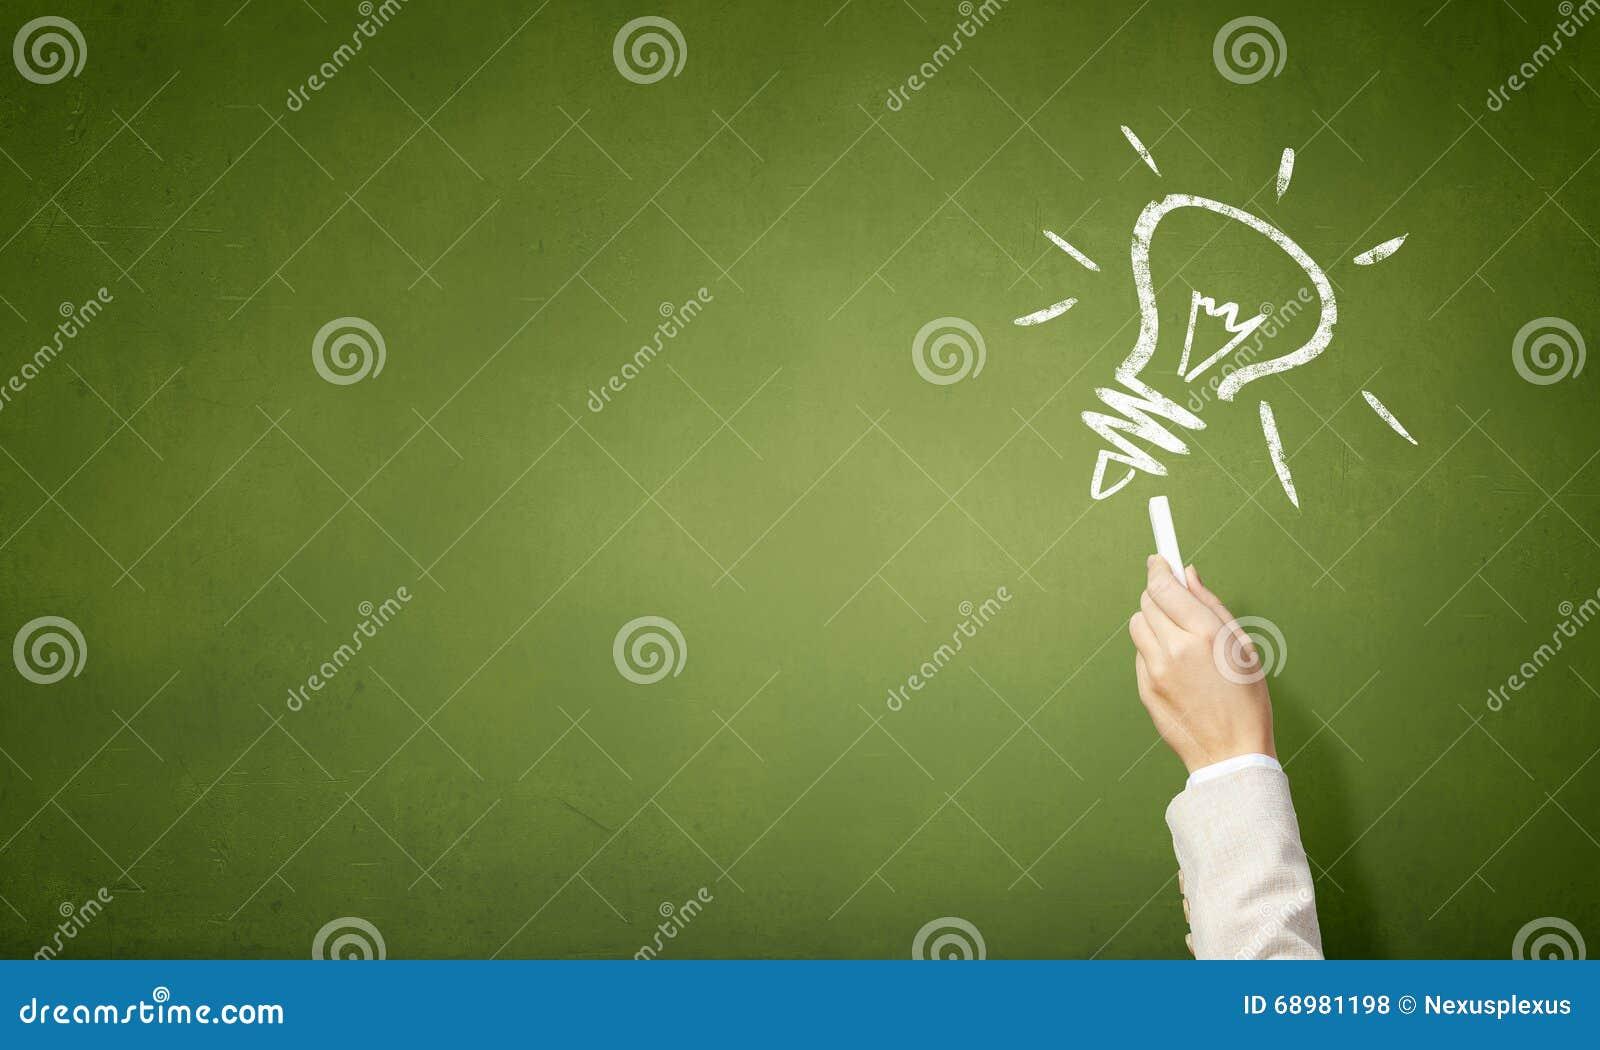 Bulbo como símbolo de la gran idea